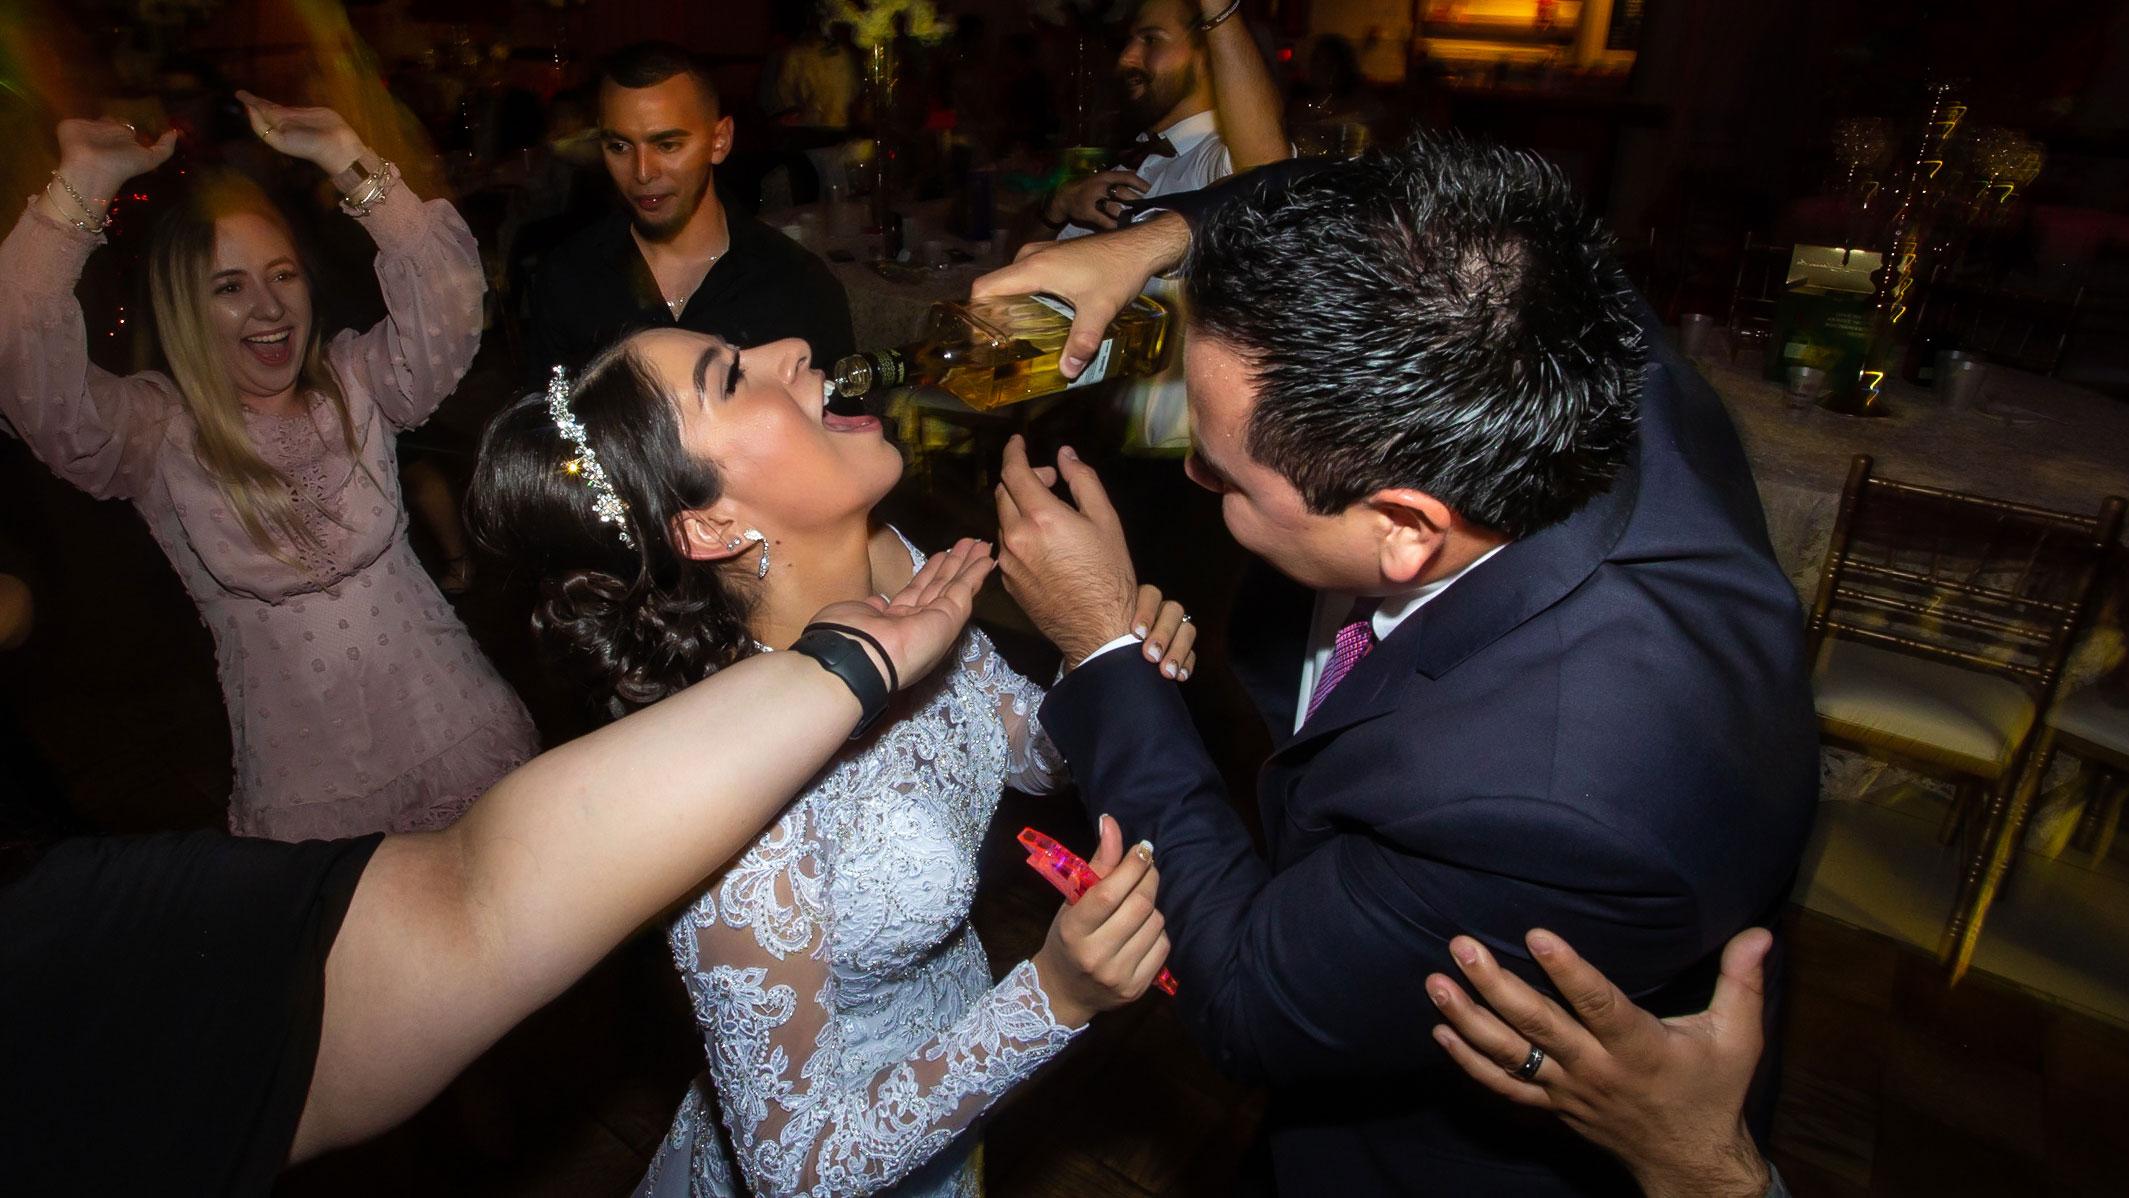 Real del Valle Event Center bride getting drunk